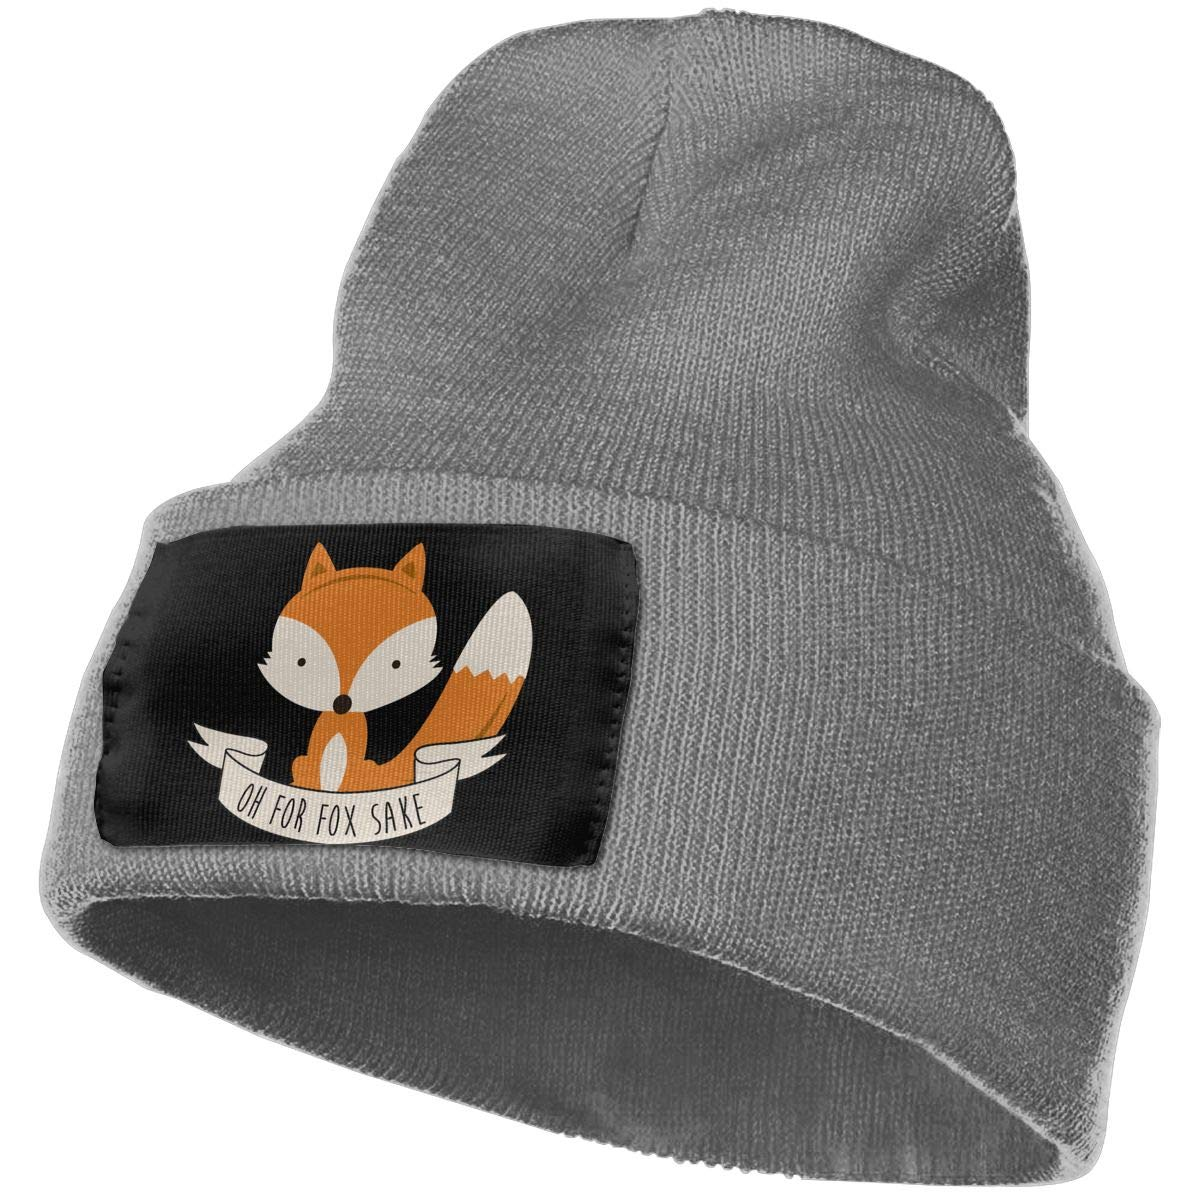 OH Fox Sake Warm Winter Hat Knit Beanie Skull Cap Cuff Beanie Hat Winter Hats for Men /& Women